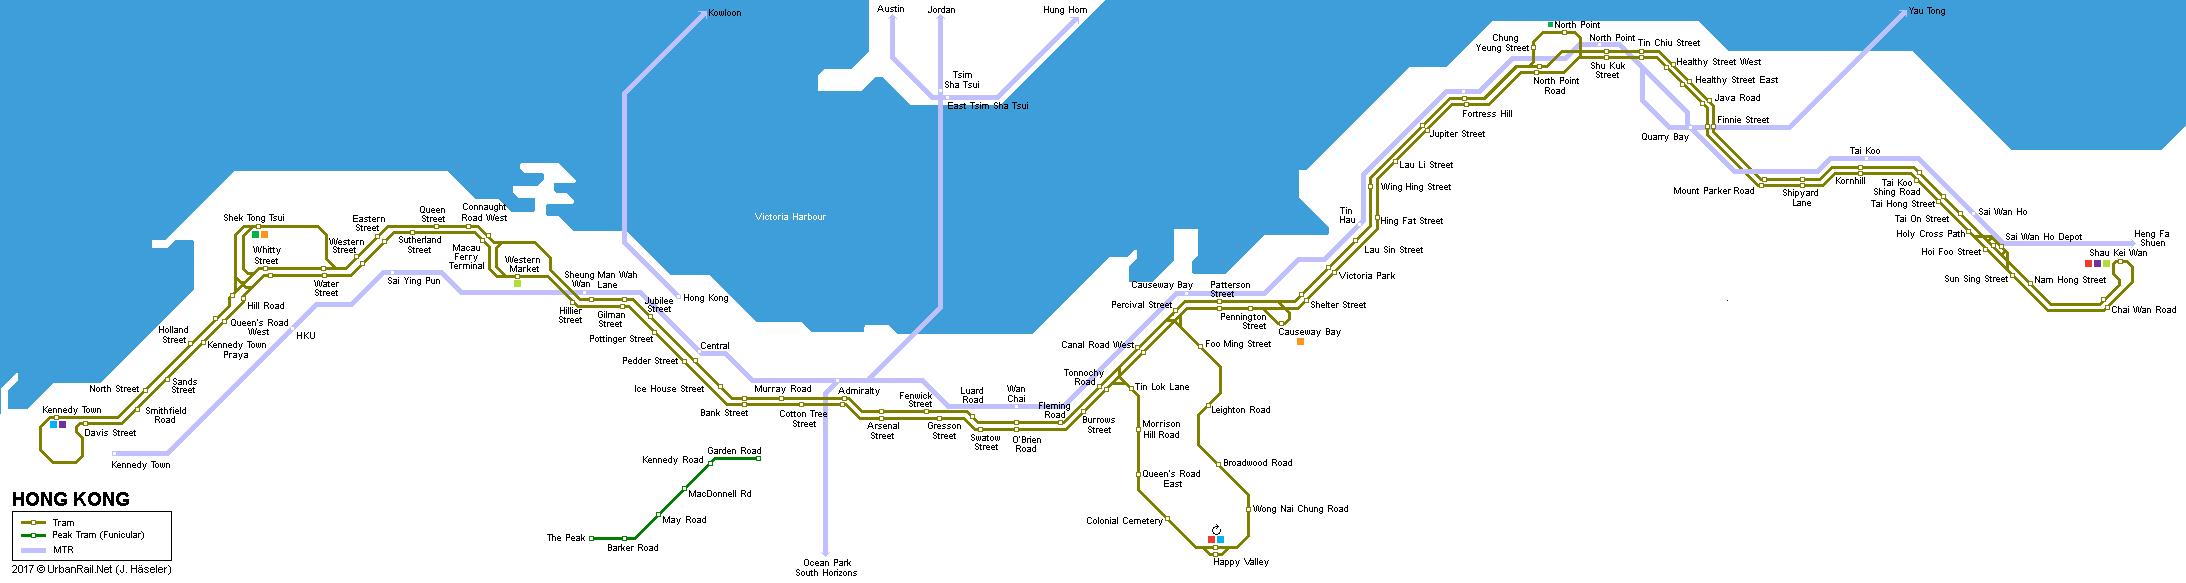 Subway Map Of Hong Kong.Urbanrail Net Asia Hong Kong Mass Transit Railway